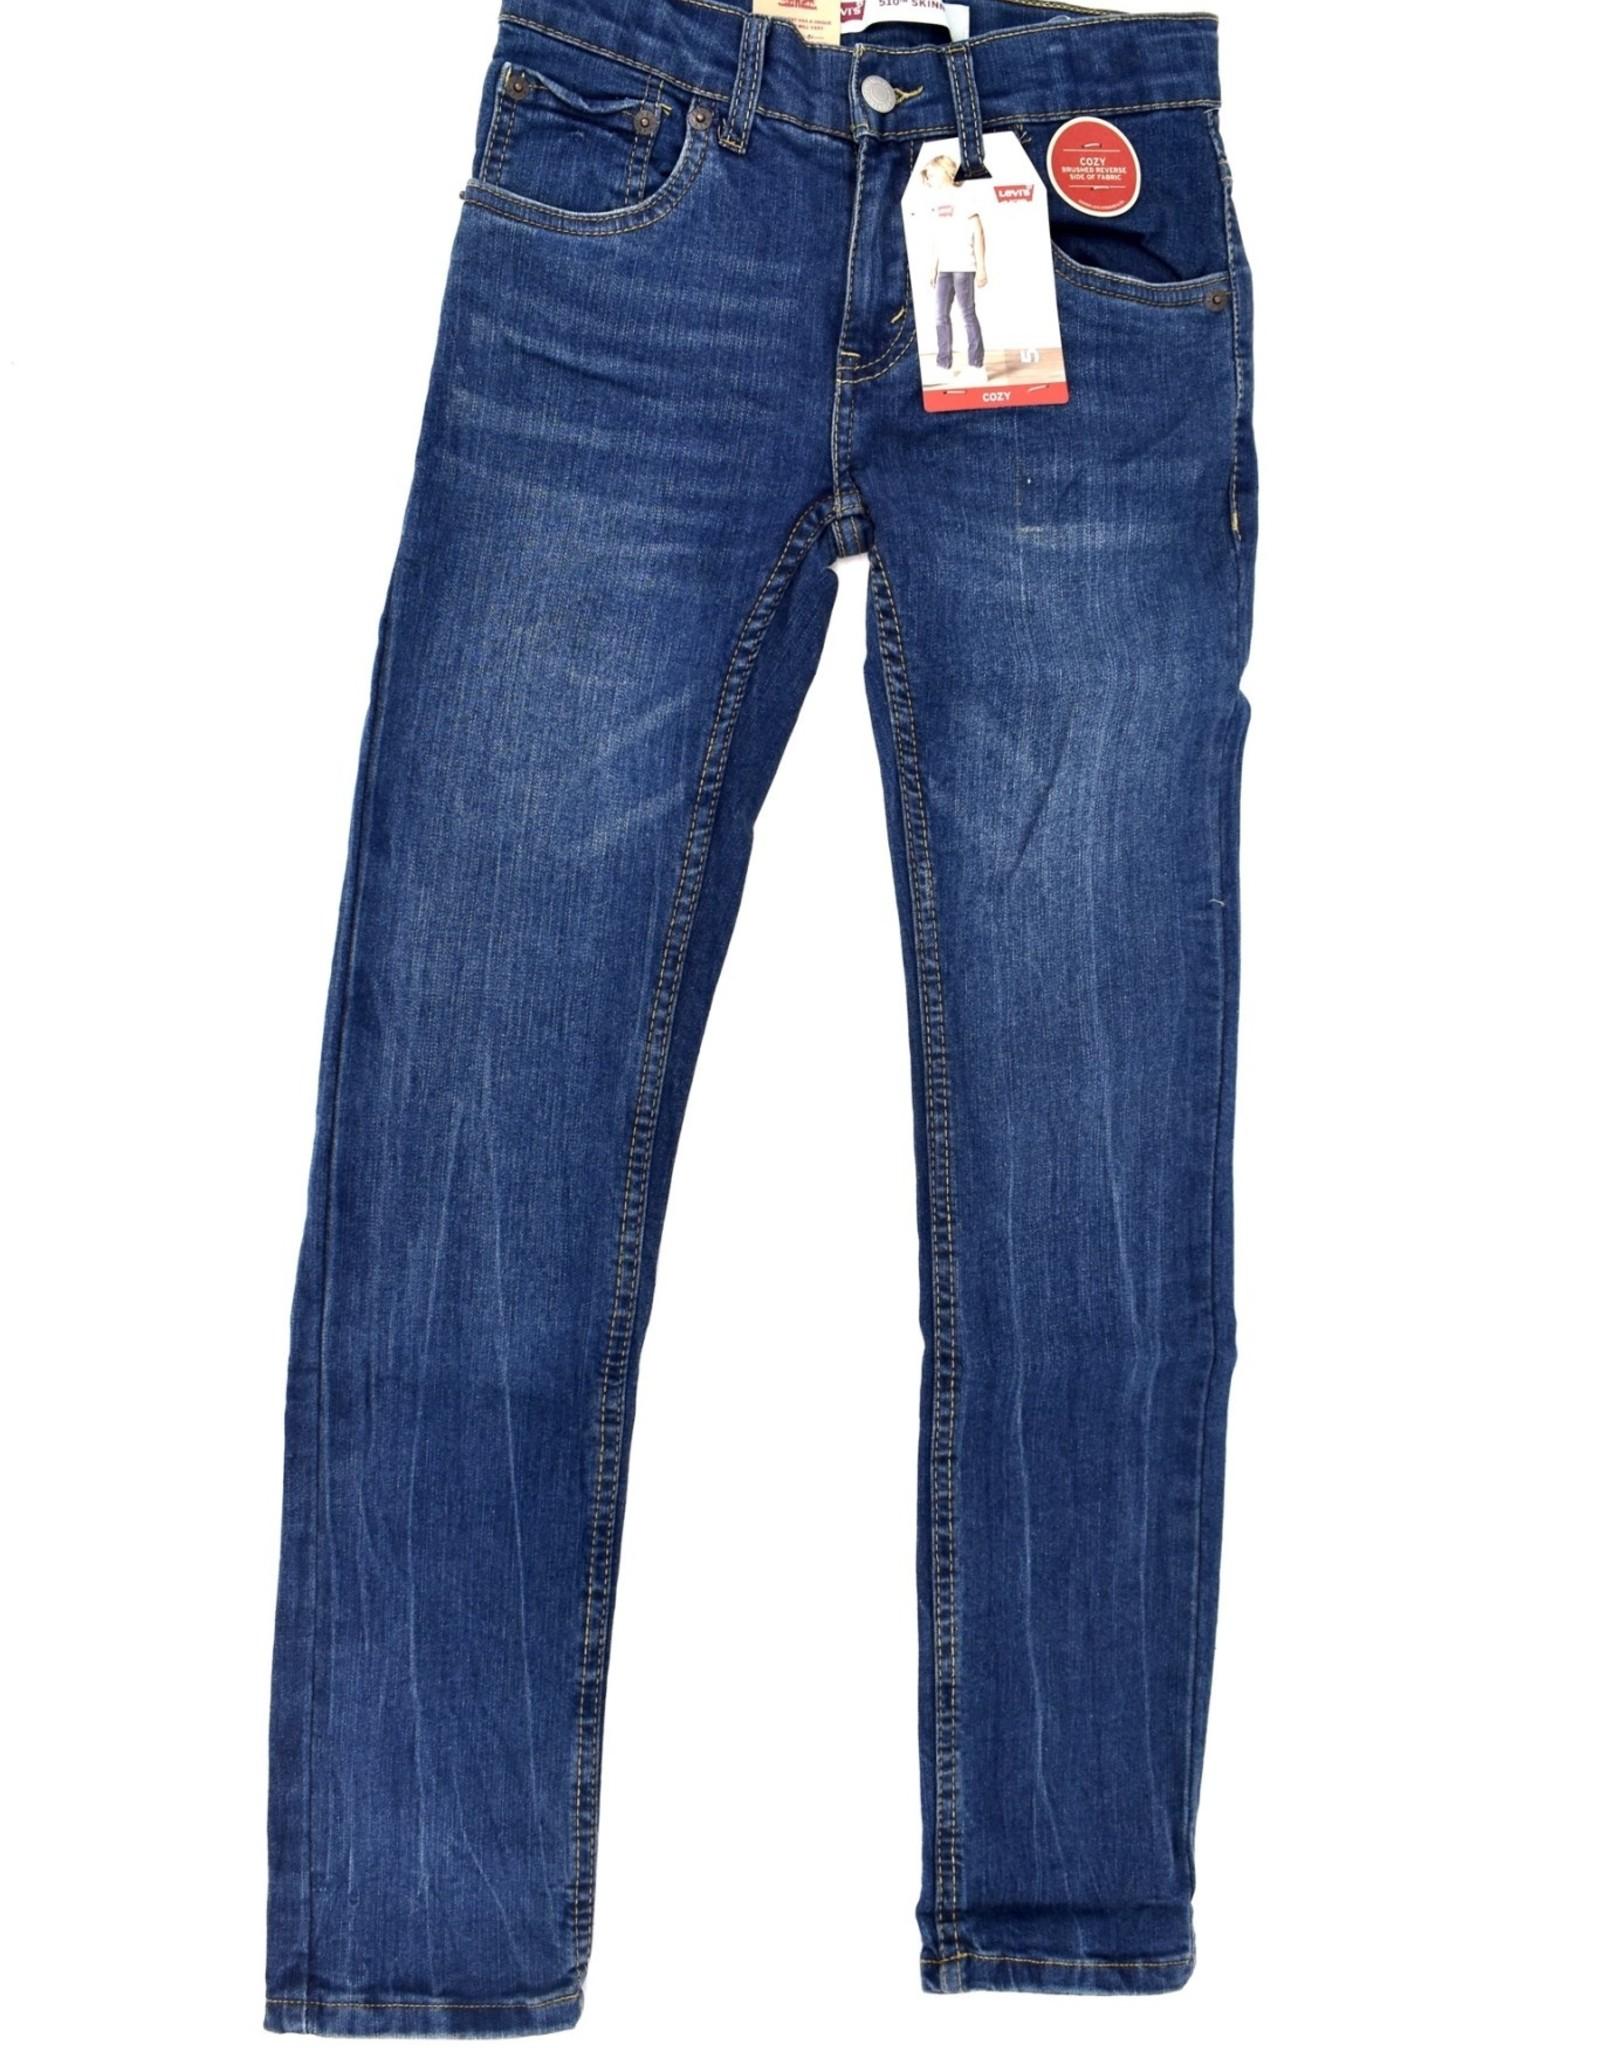 LEVI'S Lvb 510 Skinny Fit Cozy Jeans Aerosmith